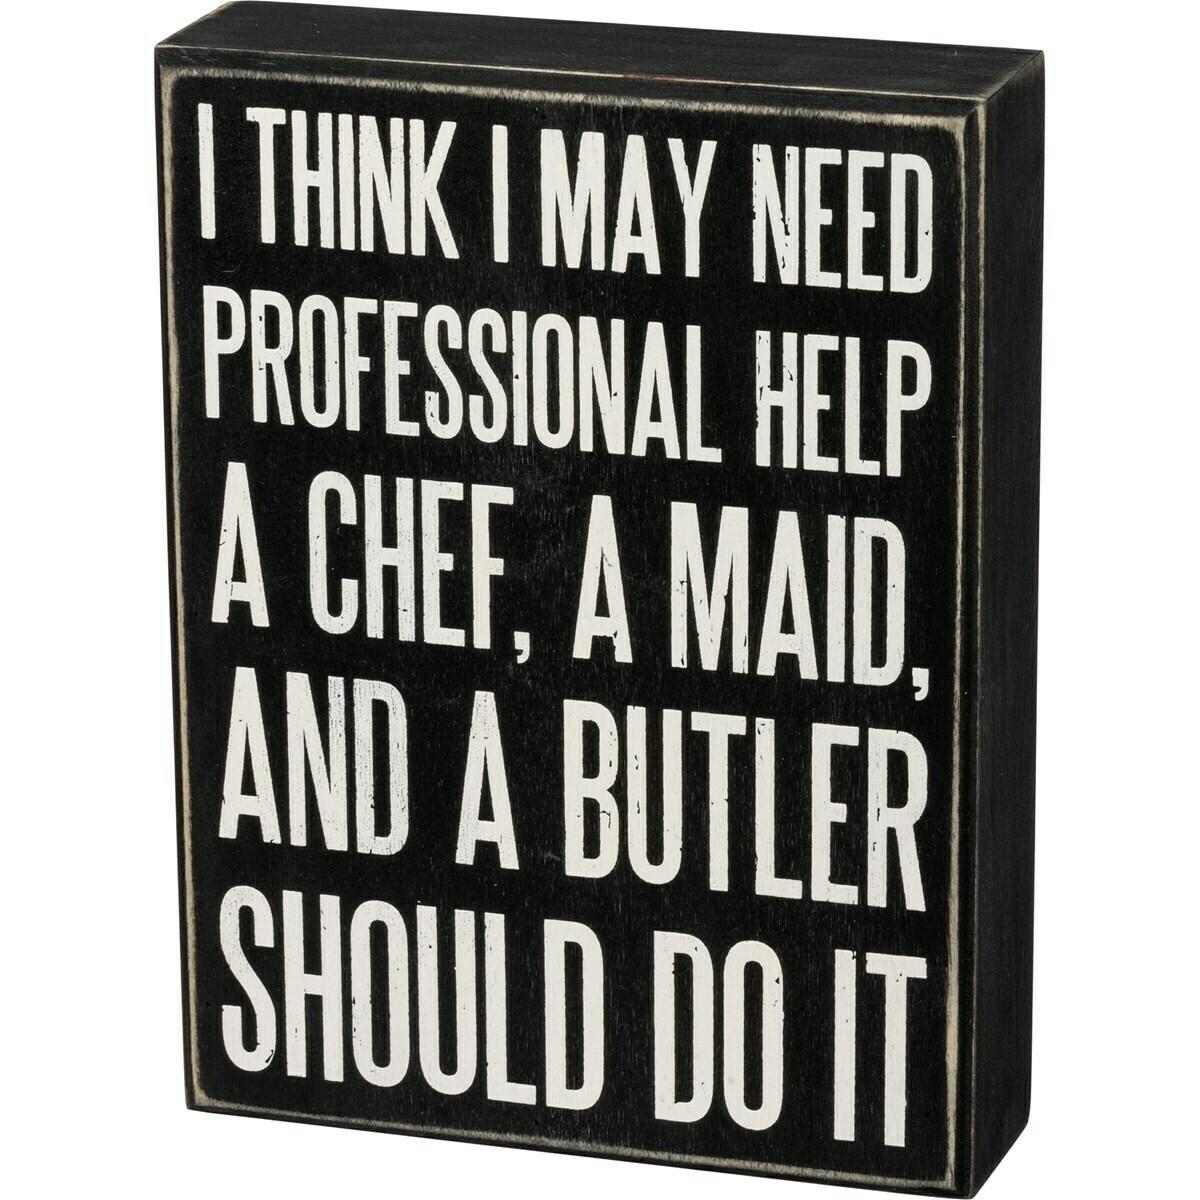 I May Need Professional Help Box Sign